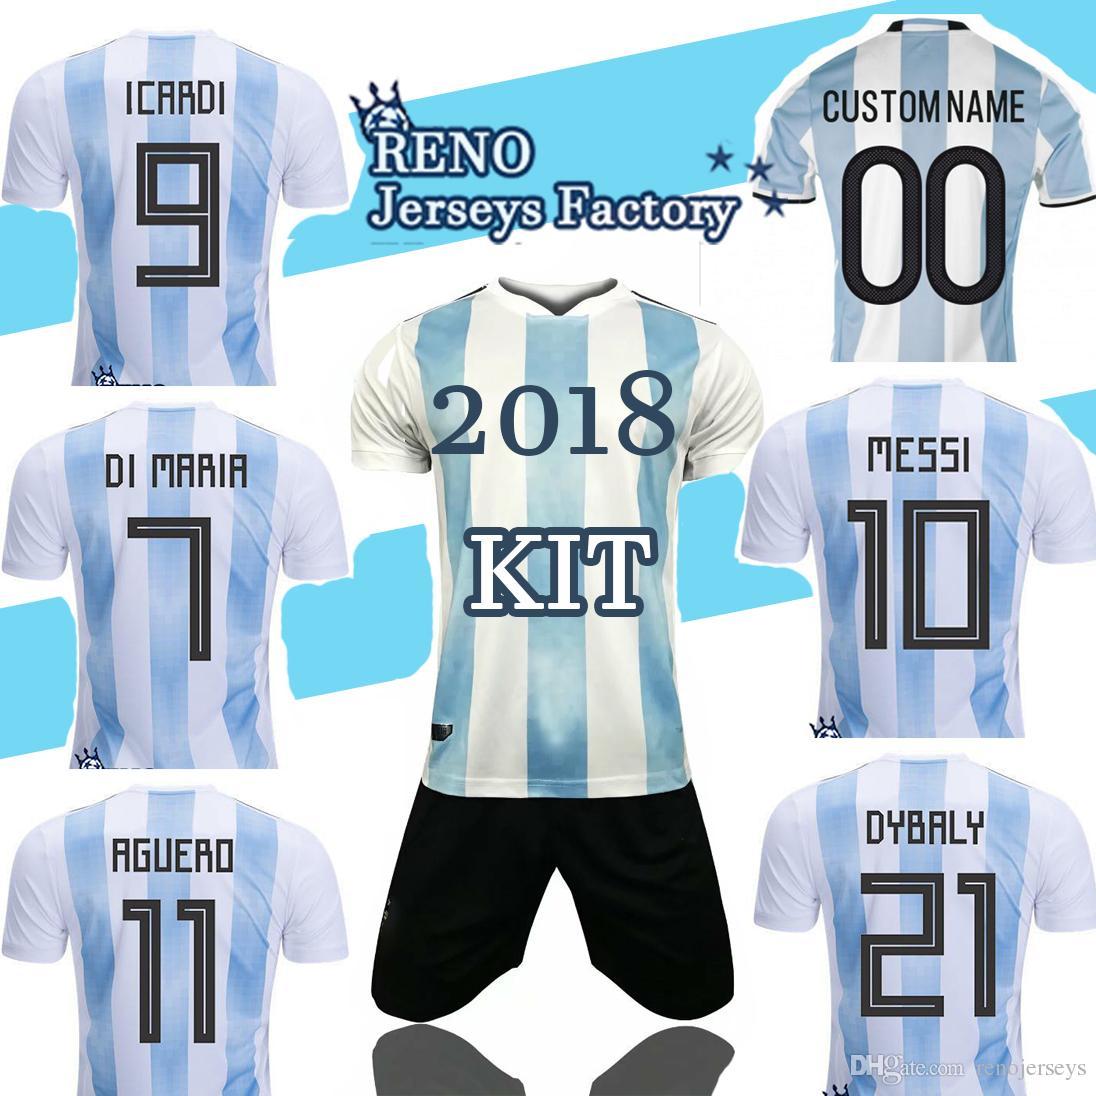 2019 Argentina Home KIT Jersey 2018 19 WORLD CUP National Team White SOCCER  HIGUAIN ICARDI MESSI AGERUO DYBALA DI MARIA Uniforms Football Shirt From ... a31de9e2c